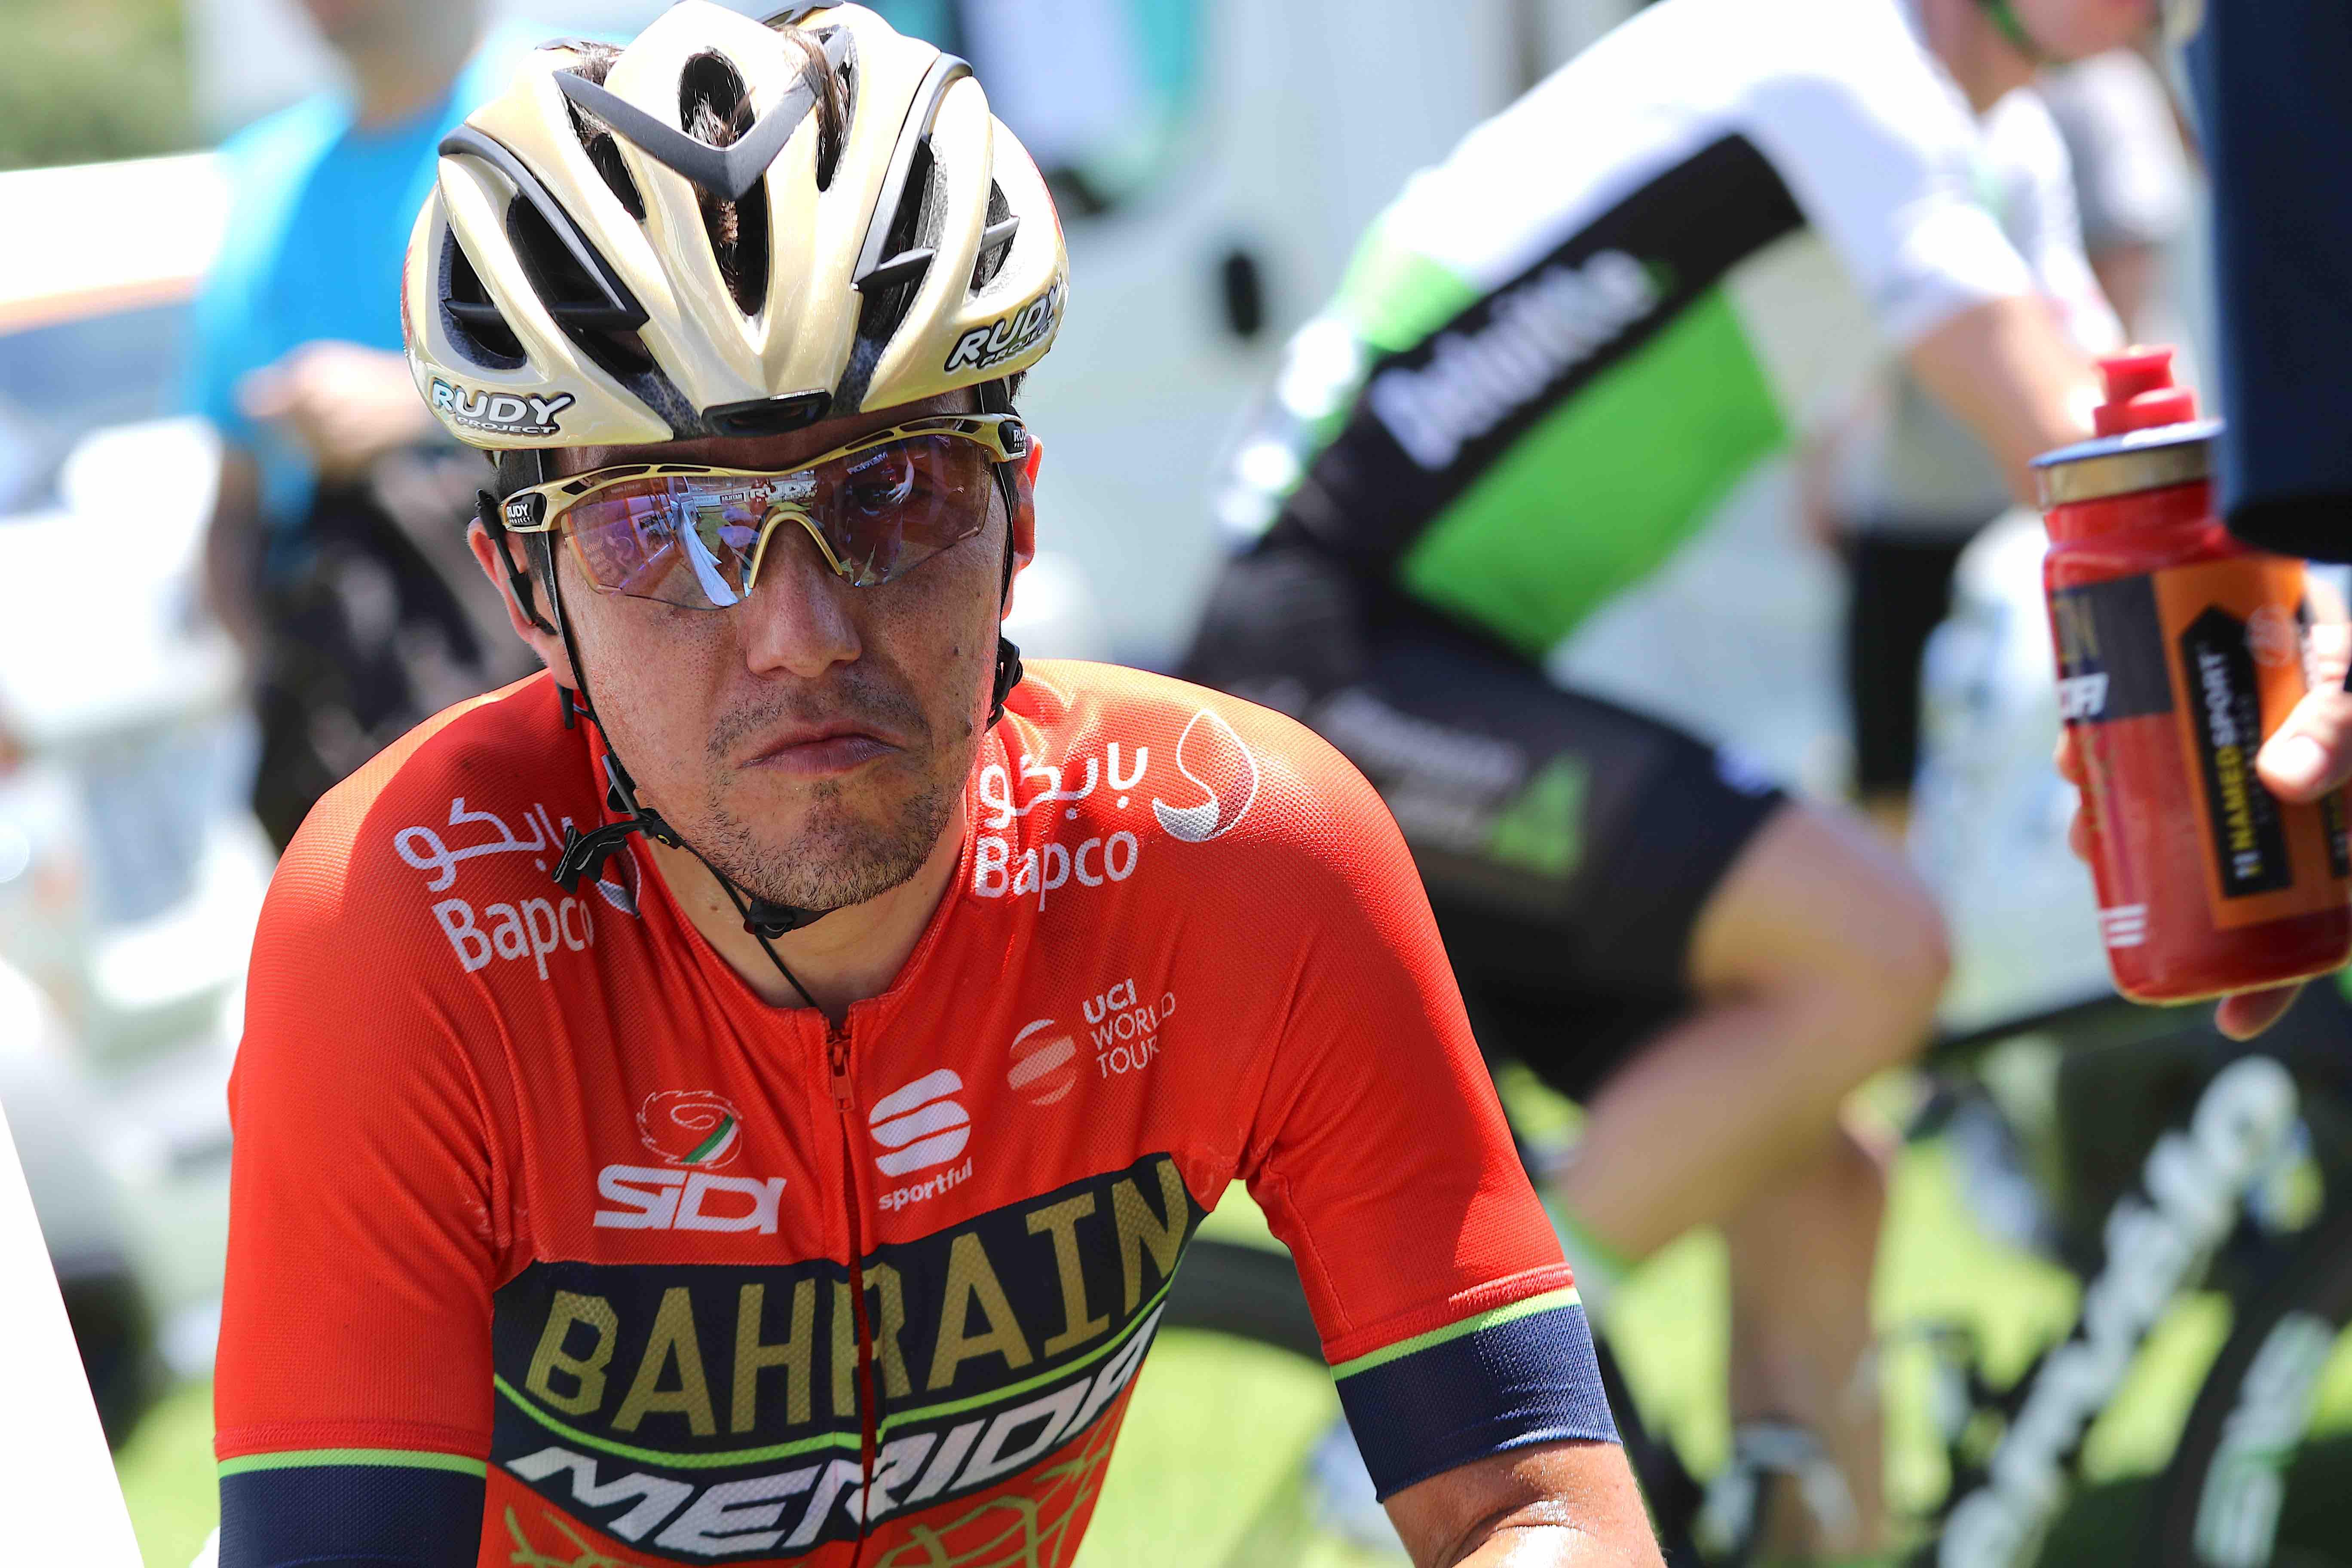 Ciclismo, Abu Dhabi Tour 2018: trionfa Alejandro Valverde in classifica generale